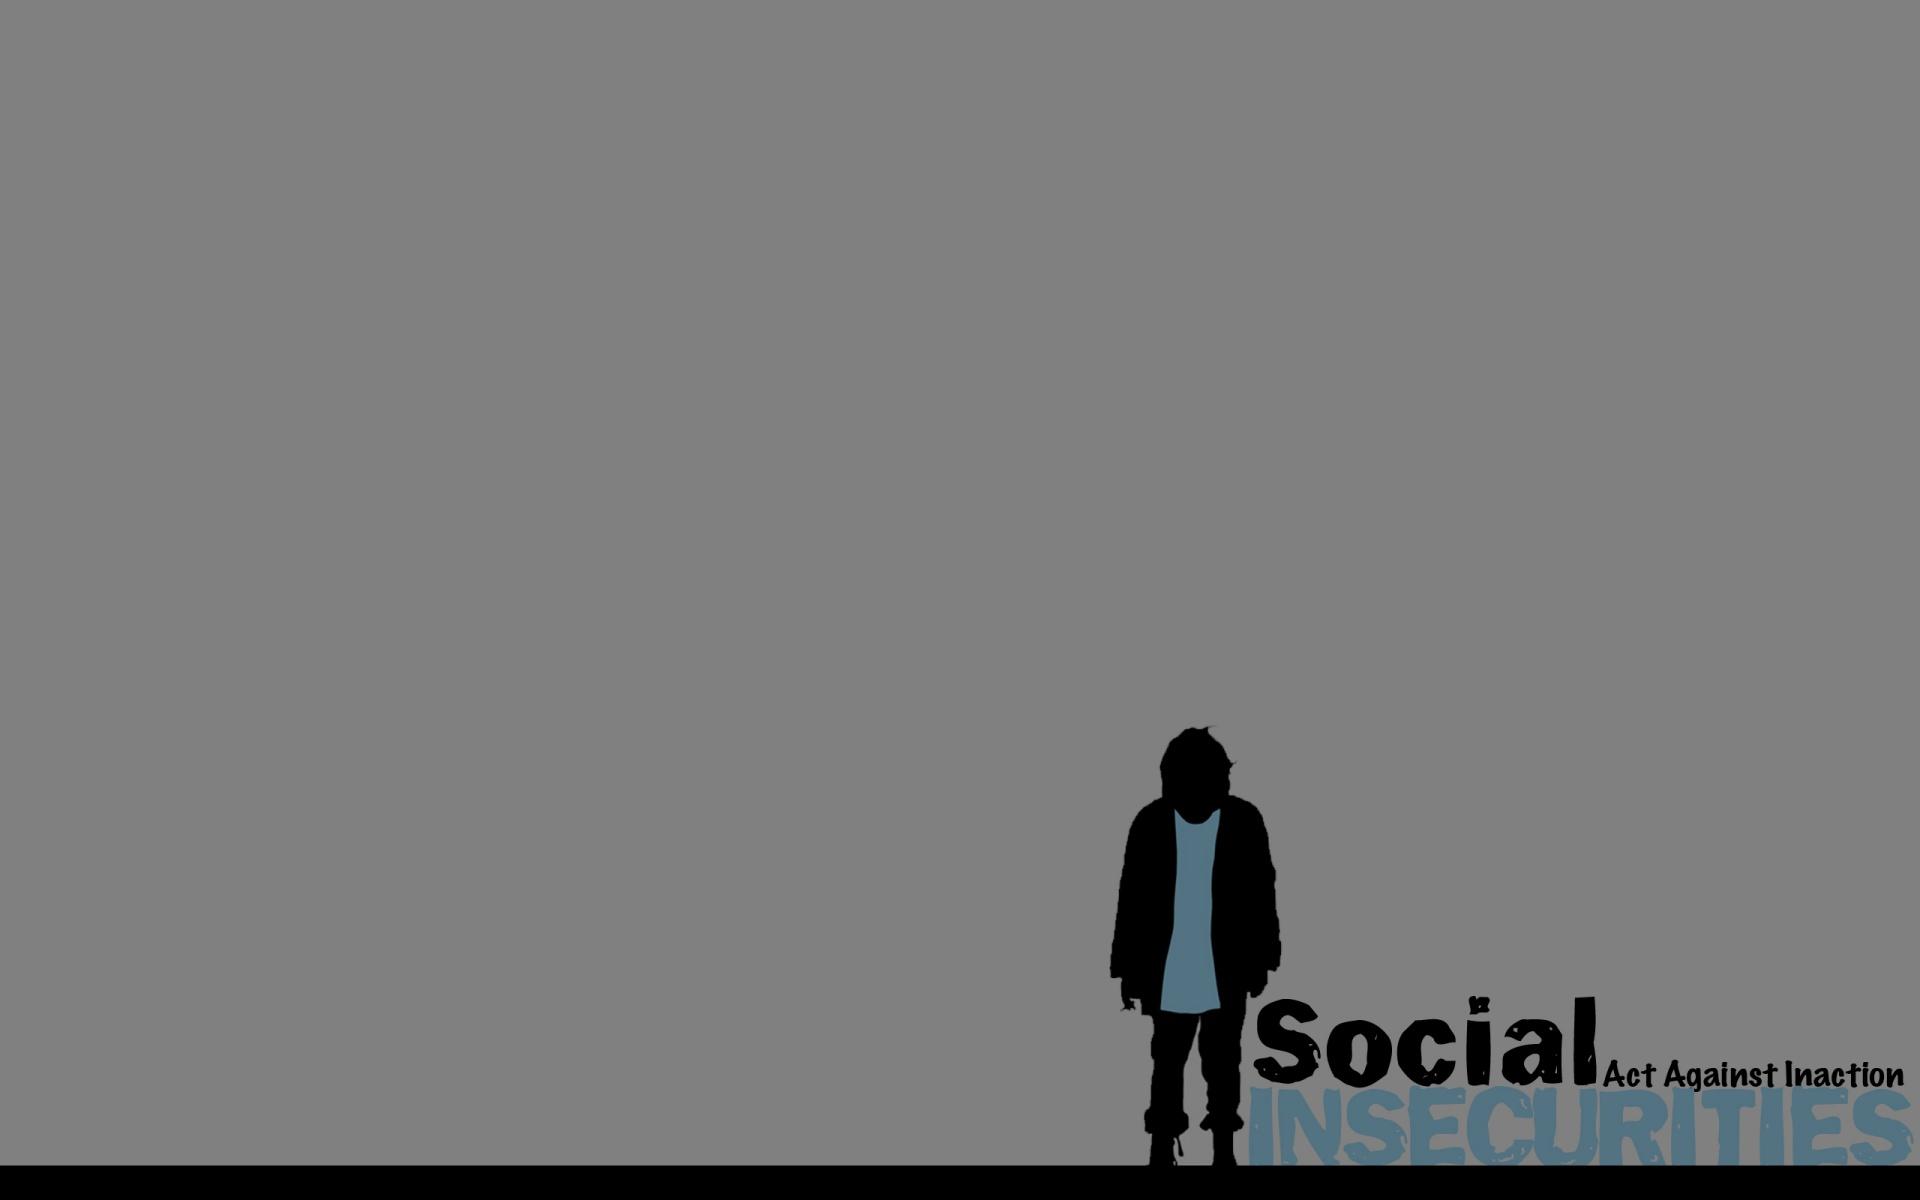 1920x1200 Social Insecurities desktop PC and Mac wallpaper 1920x1200